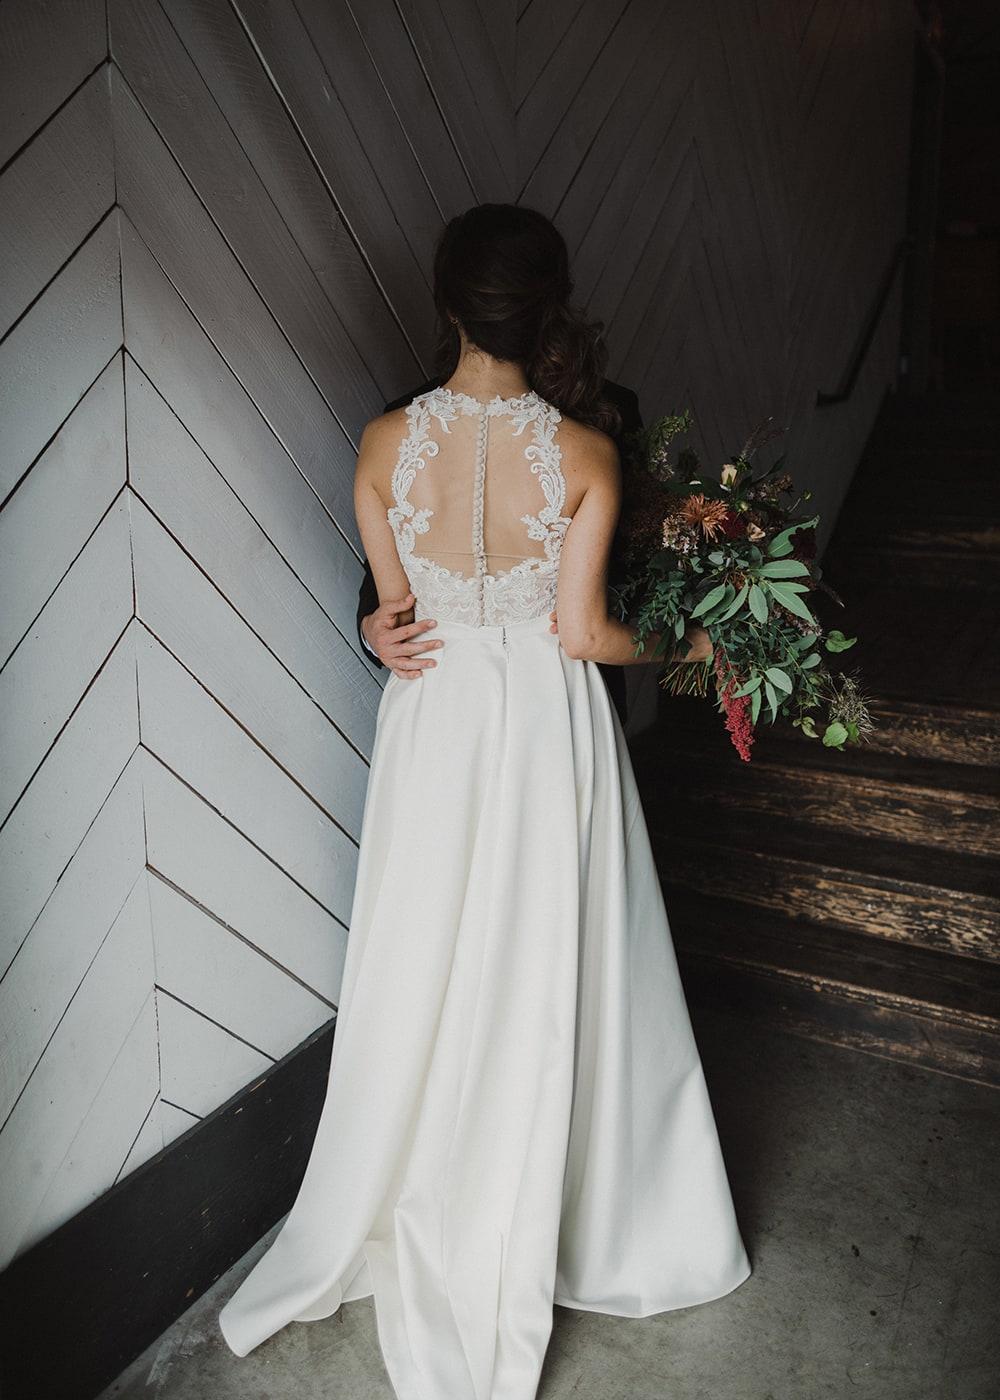 back of bride's dress in sunlight